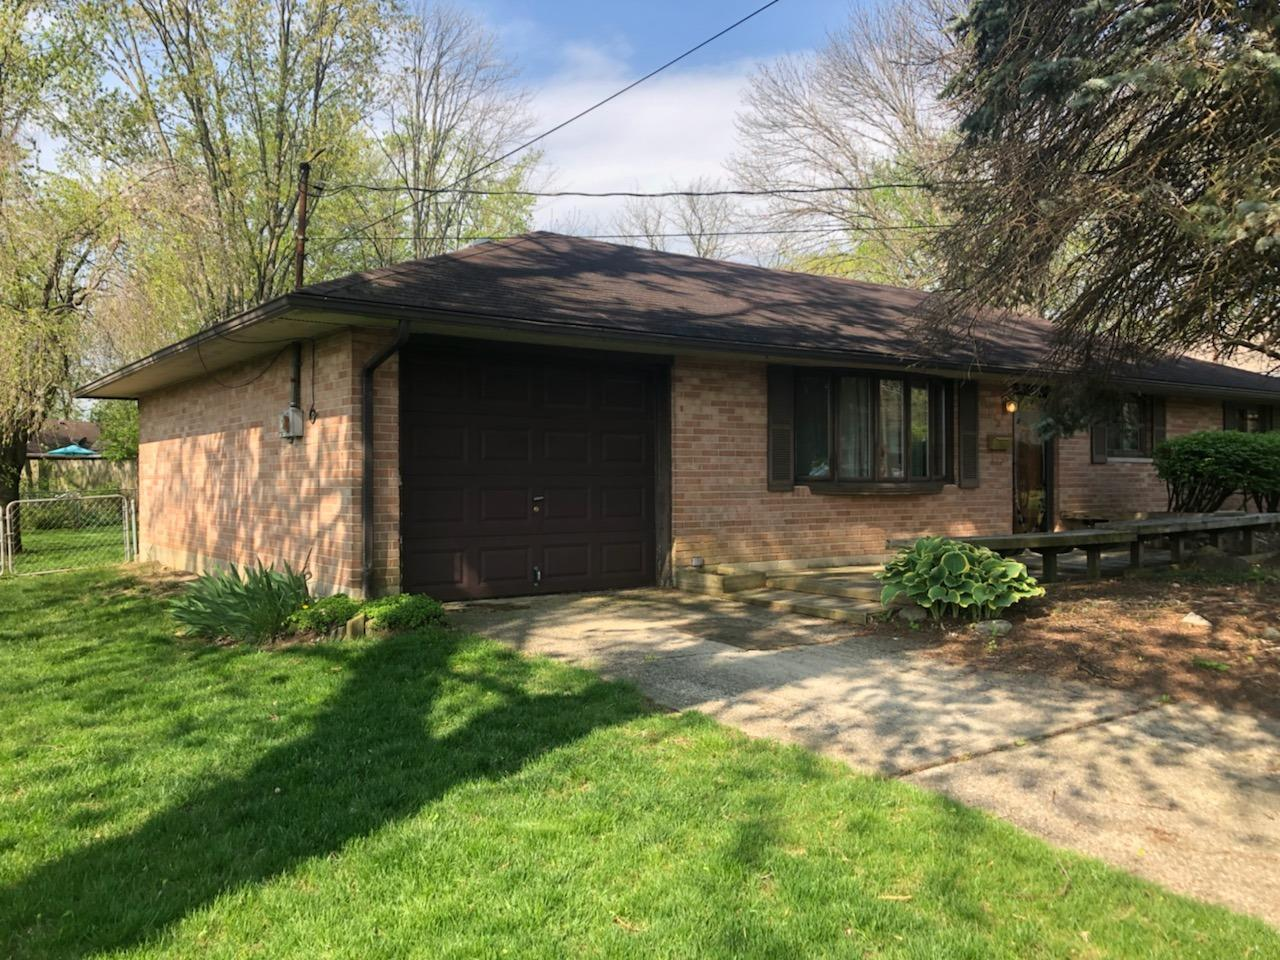 Property for sale at 1013 Winding Way, Lebanon,  Ohio 45036